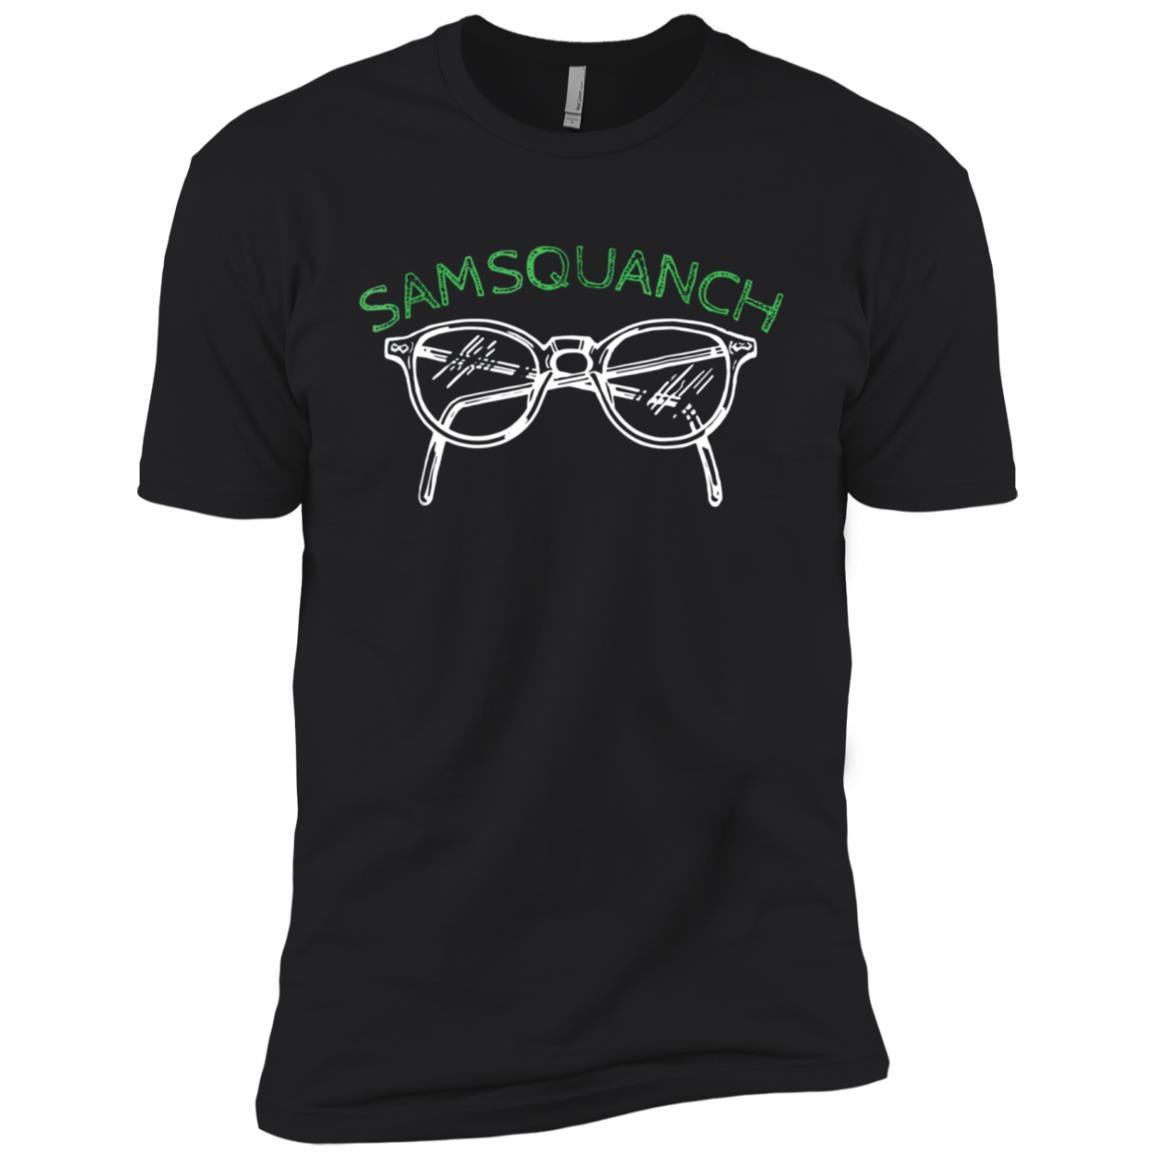 Samsquanch Funny Looking Glasses Bigfoot Men Short Sleeve T-Shirt